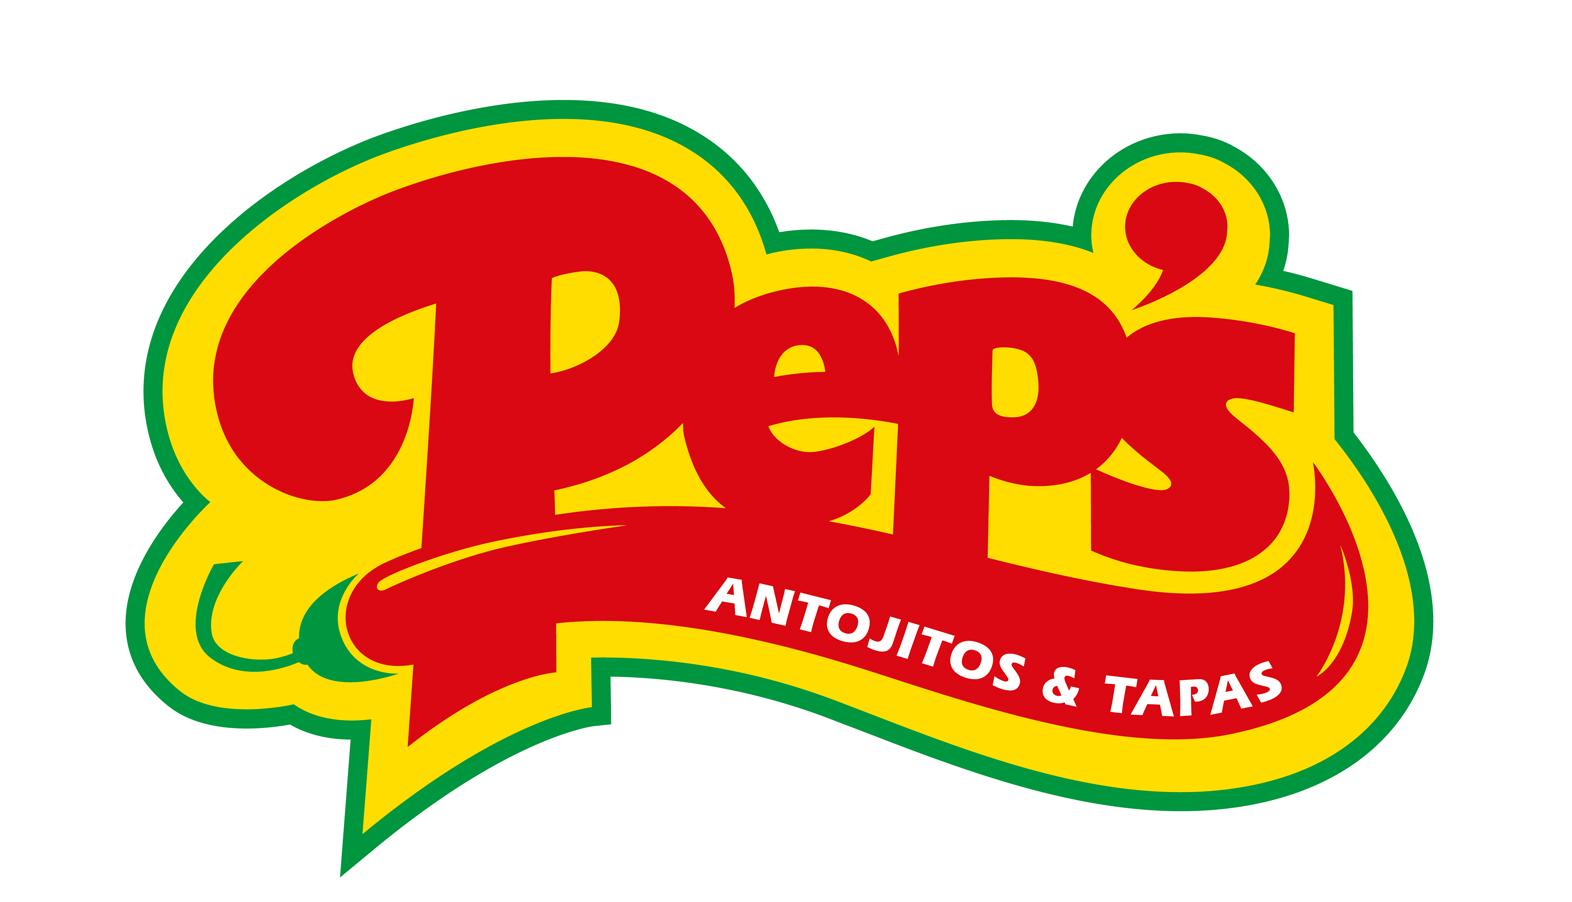 Pep's-logo_fc